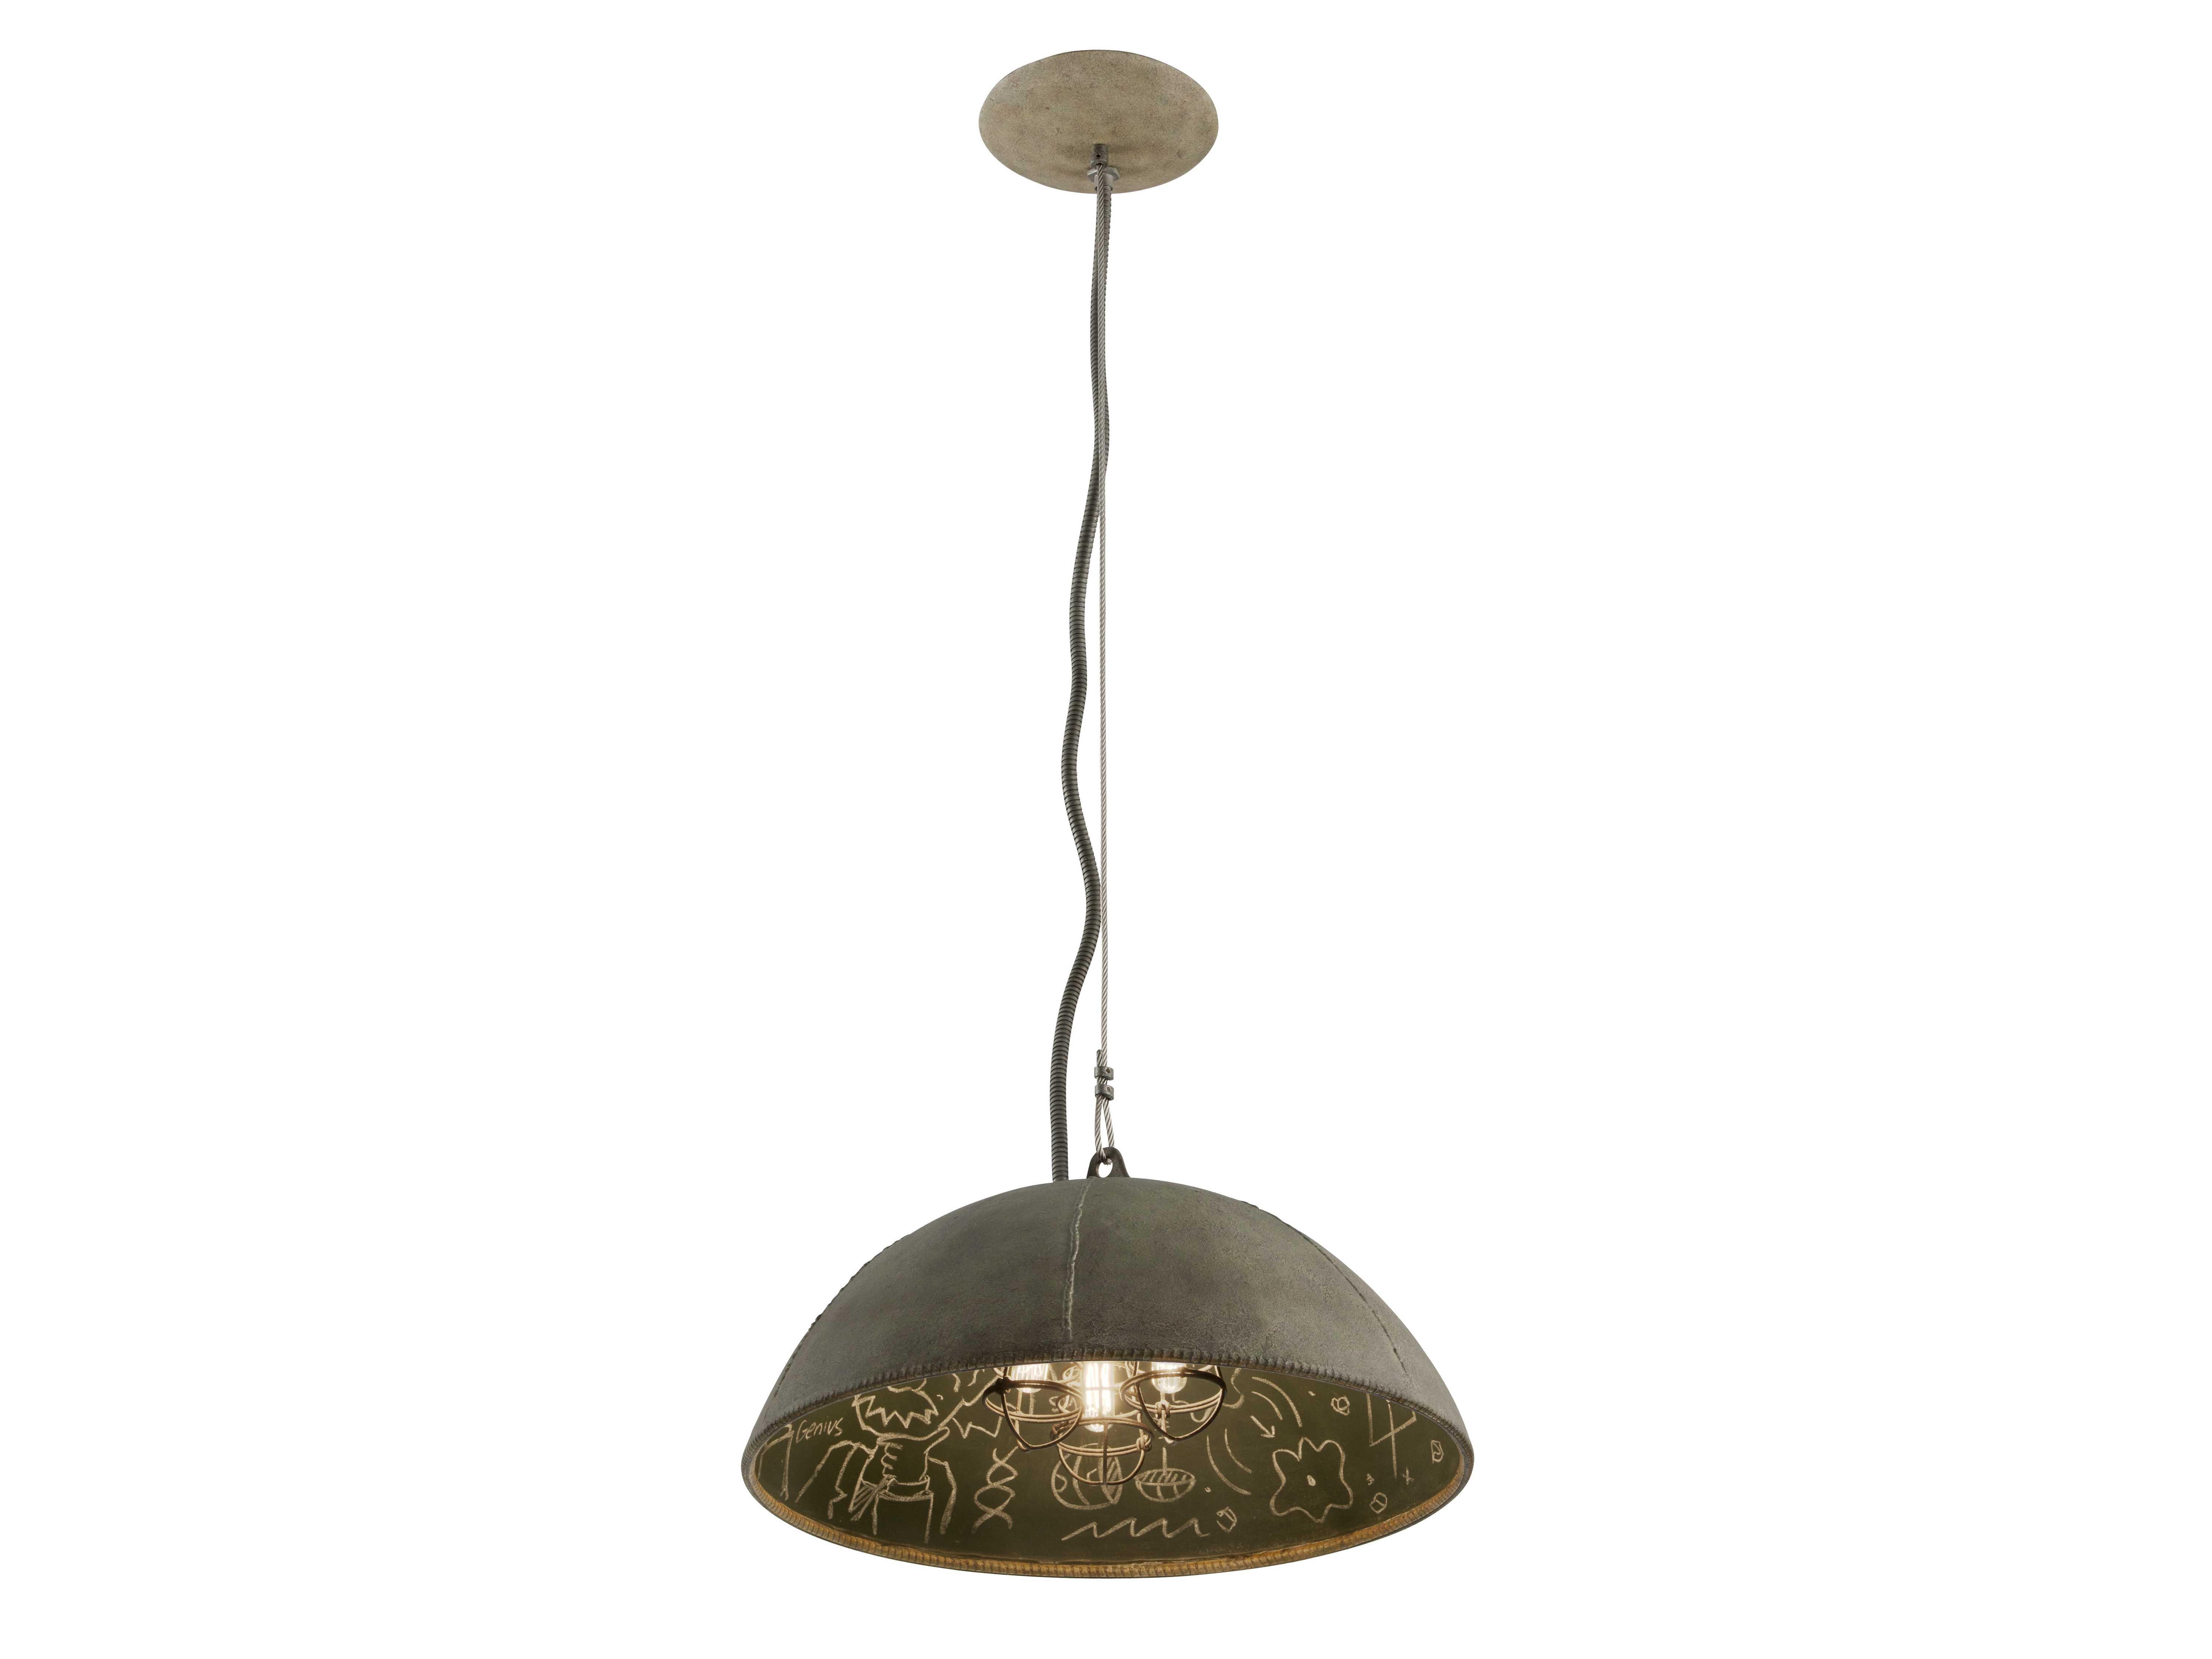 Zinc Pendant Lighting : Troy lighting relativity salvage zinc with chalkboard interior three light pendant f